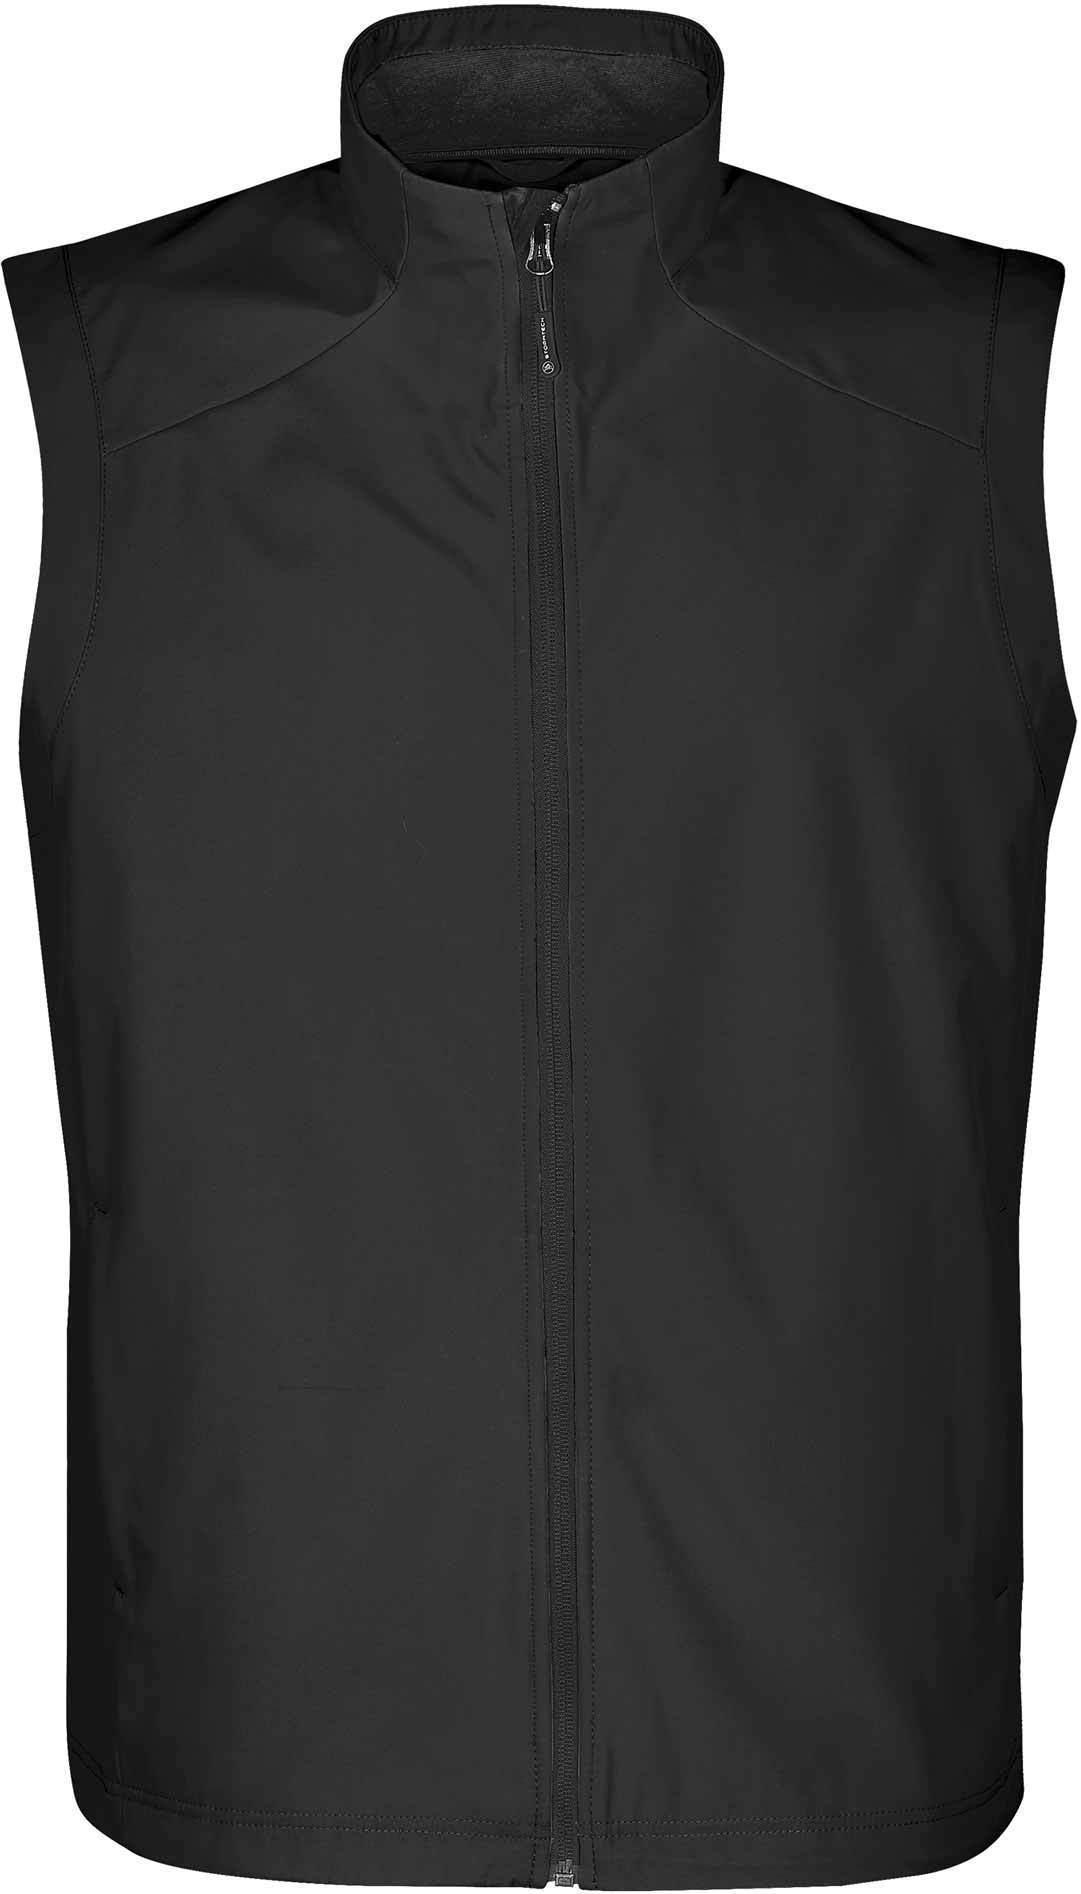 Stormtech Women's Endurance Bodywarmer – Black – Size L